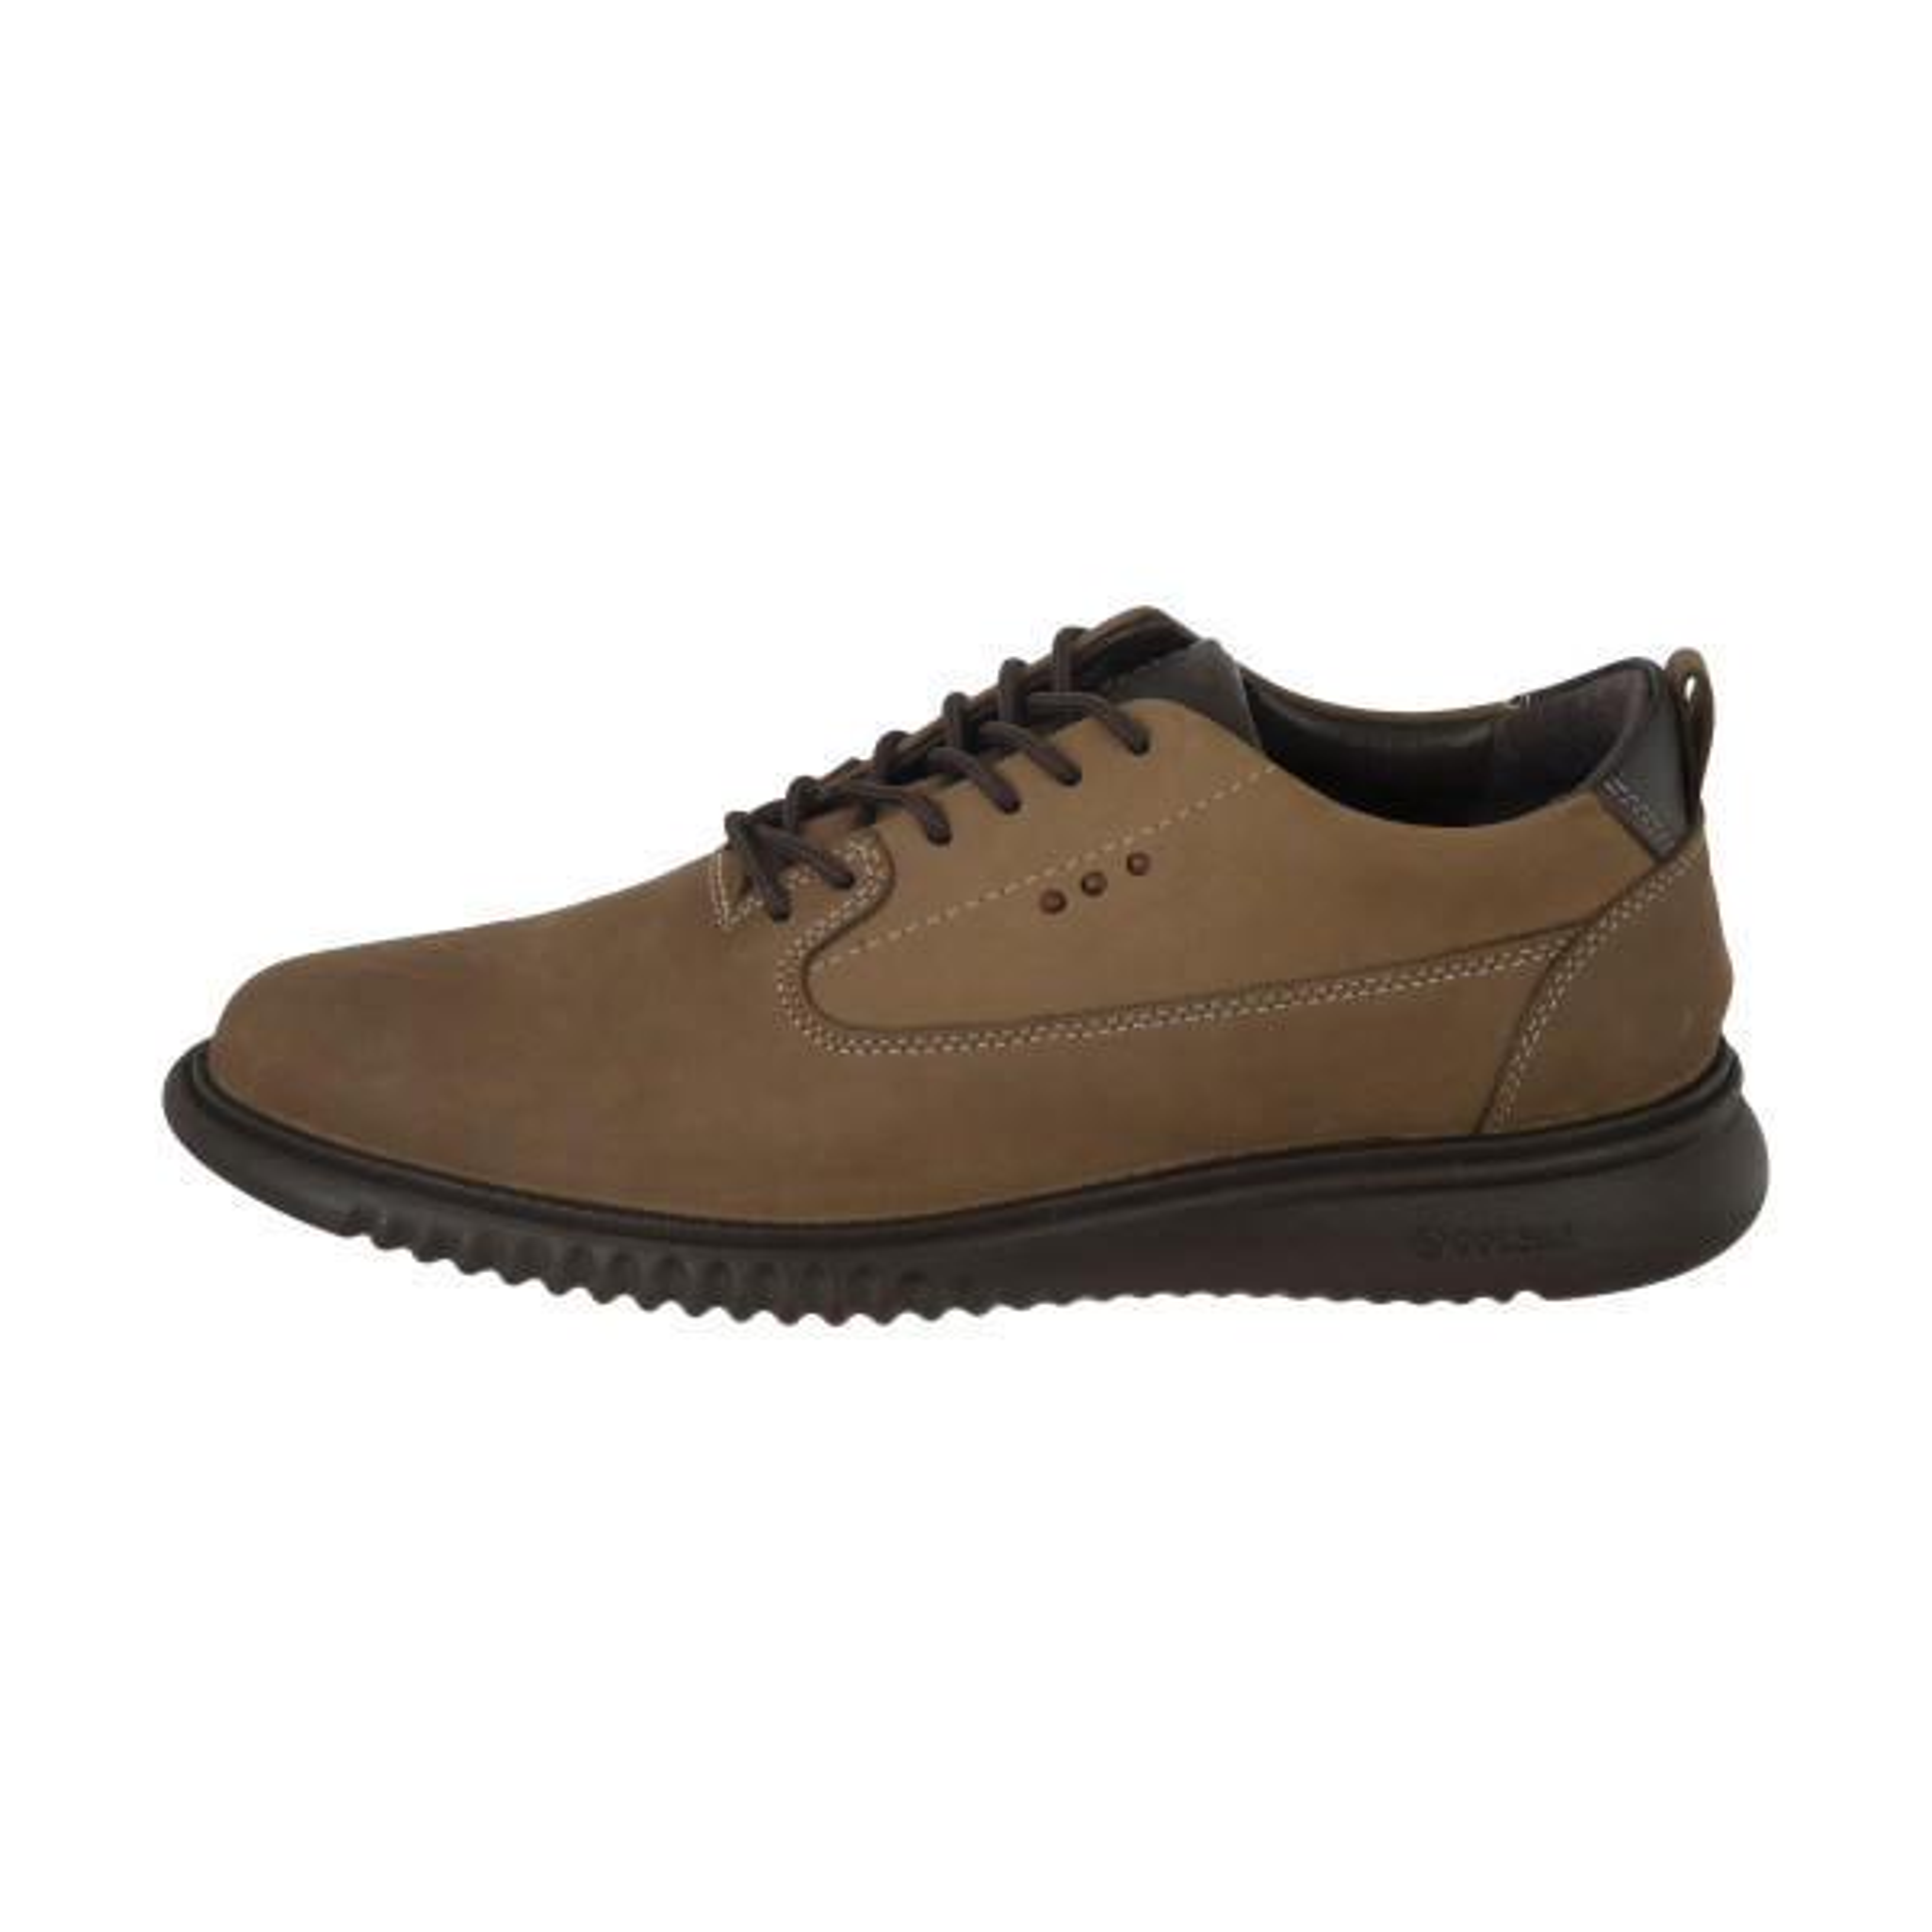 کفش روزمره مردانه گلسار مدل 7F03A503134